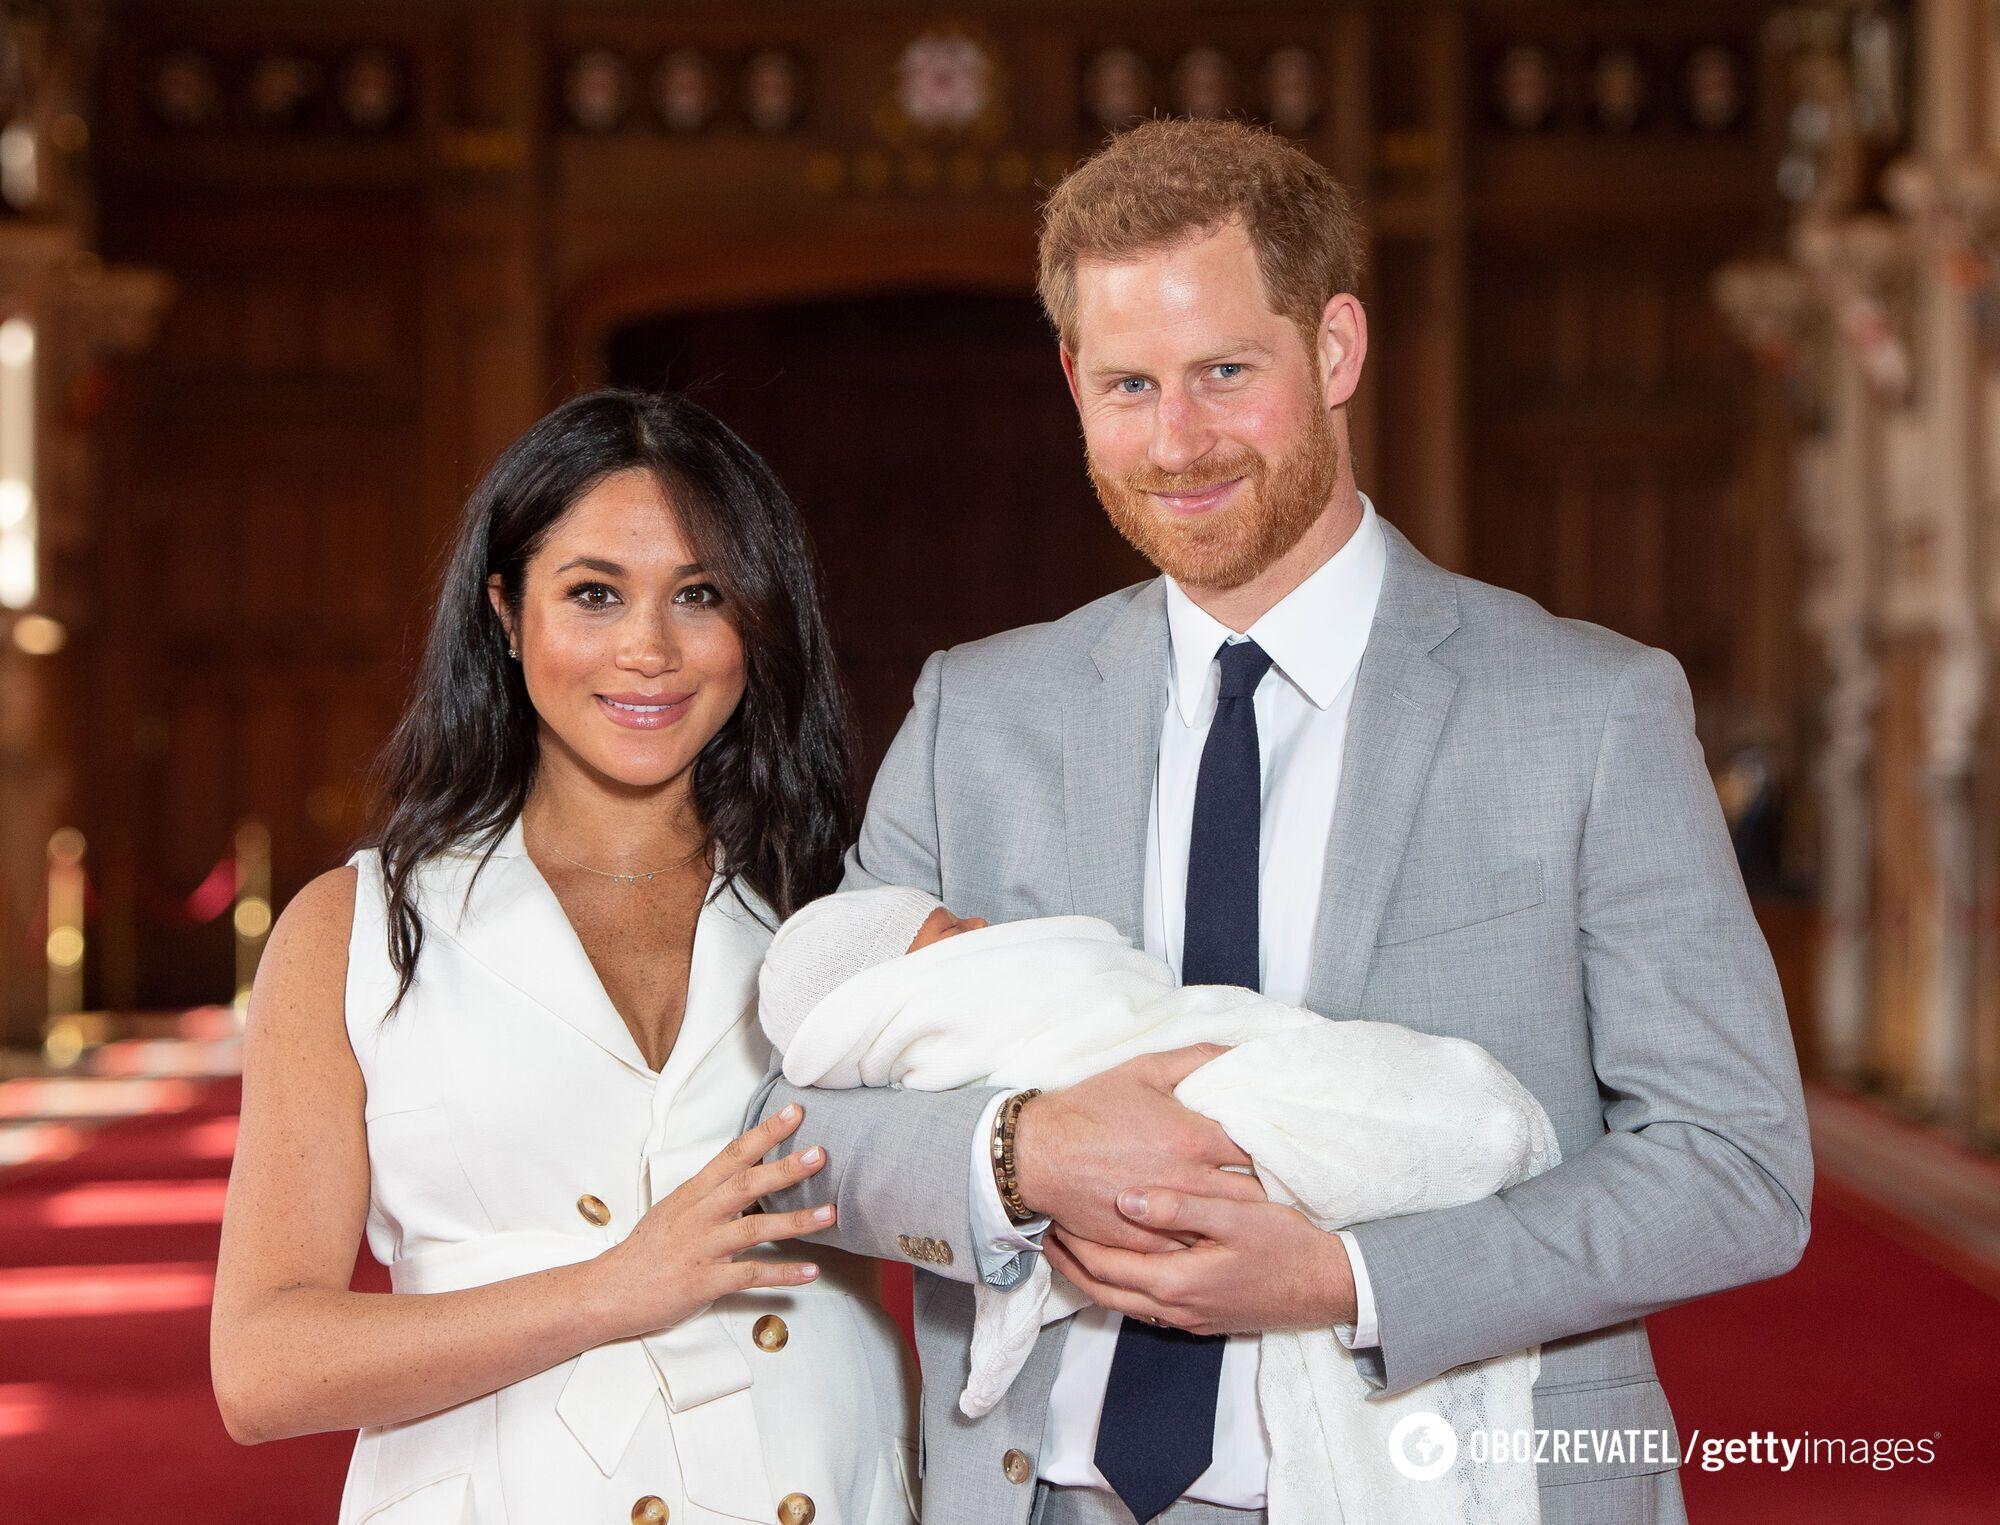 Принц Гарри вместе с Меган Маркл и сыном Арчи